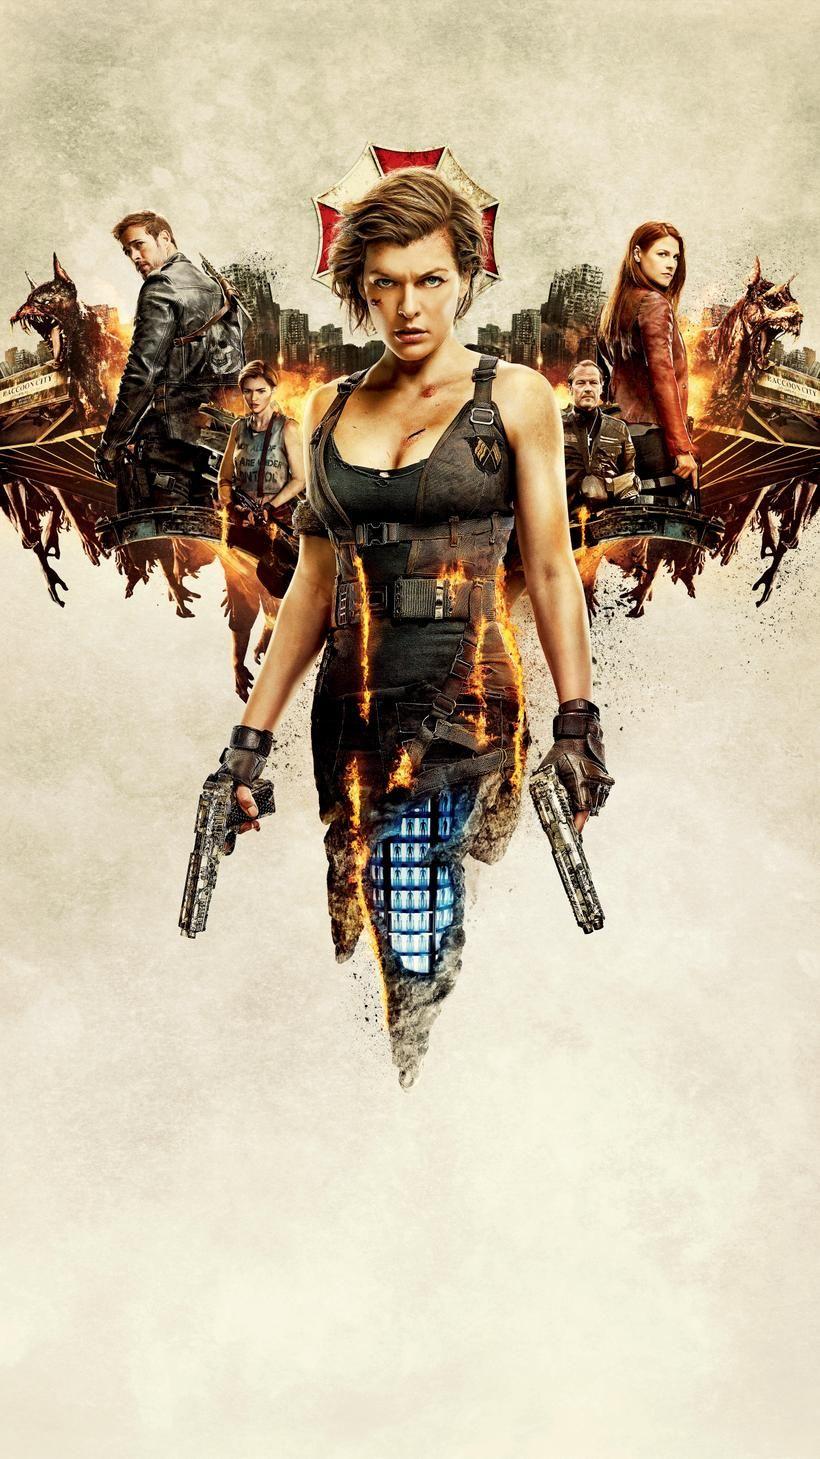 Resident Evil The Final Chapter 2016 Phone Wallpaper